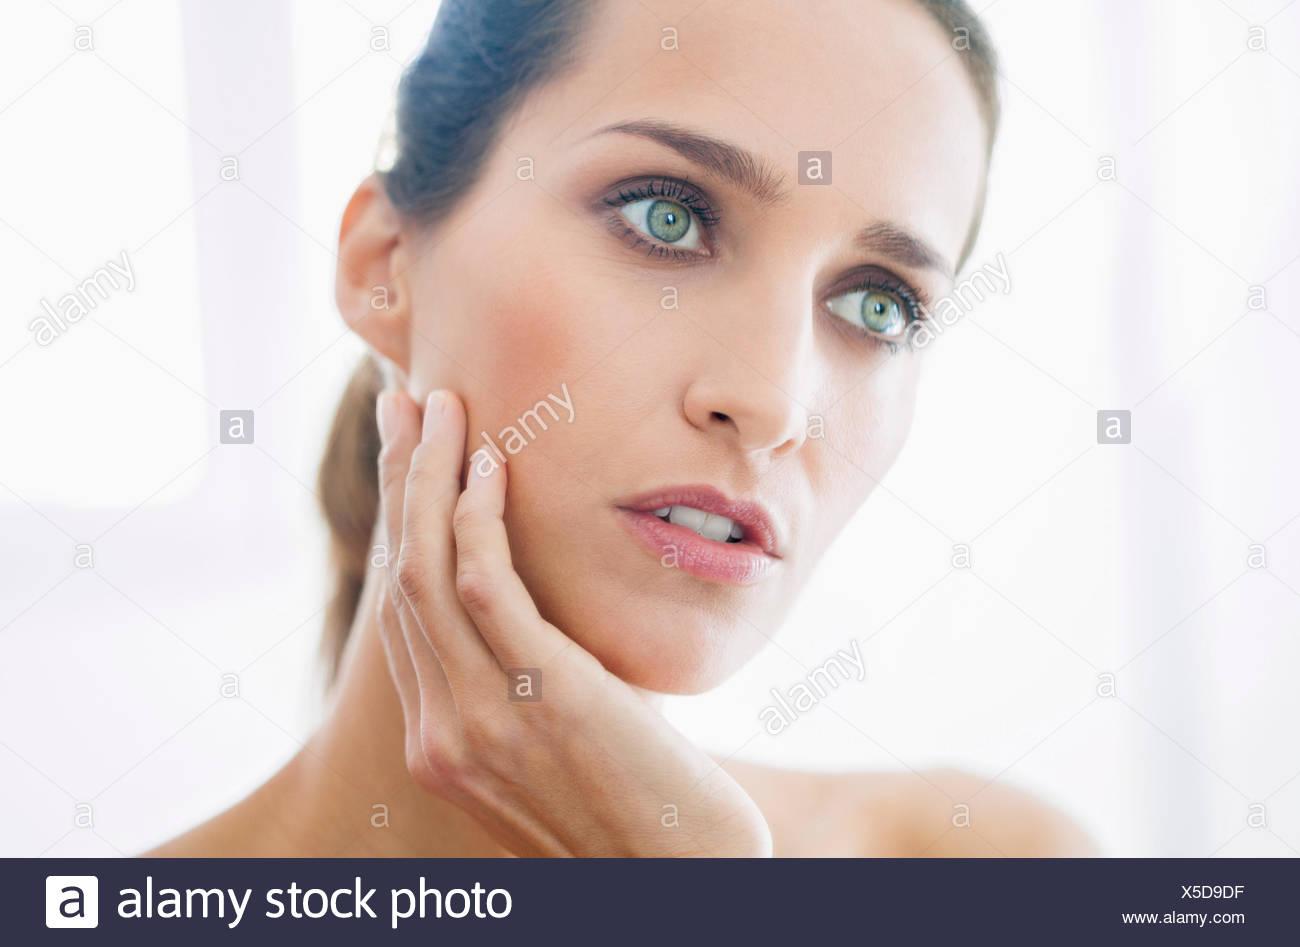 Close-up of a beautiful woman looking away - Stock Image